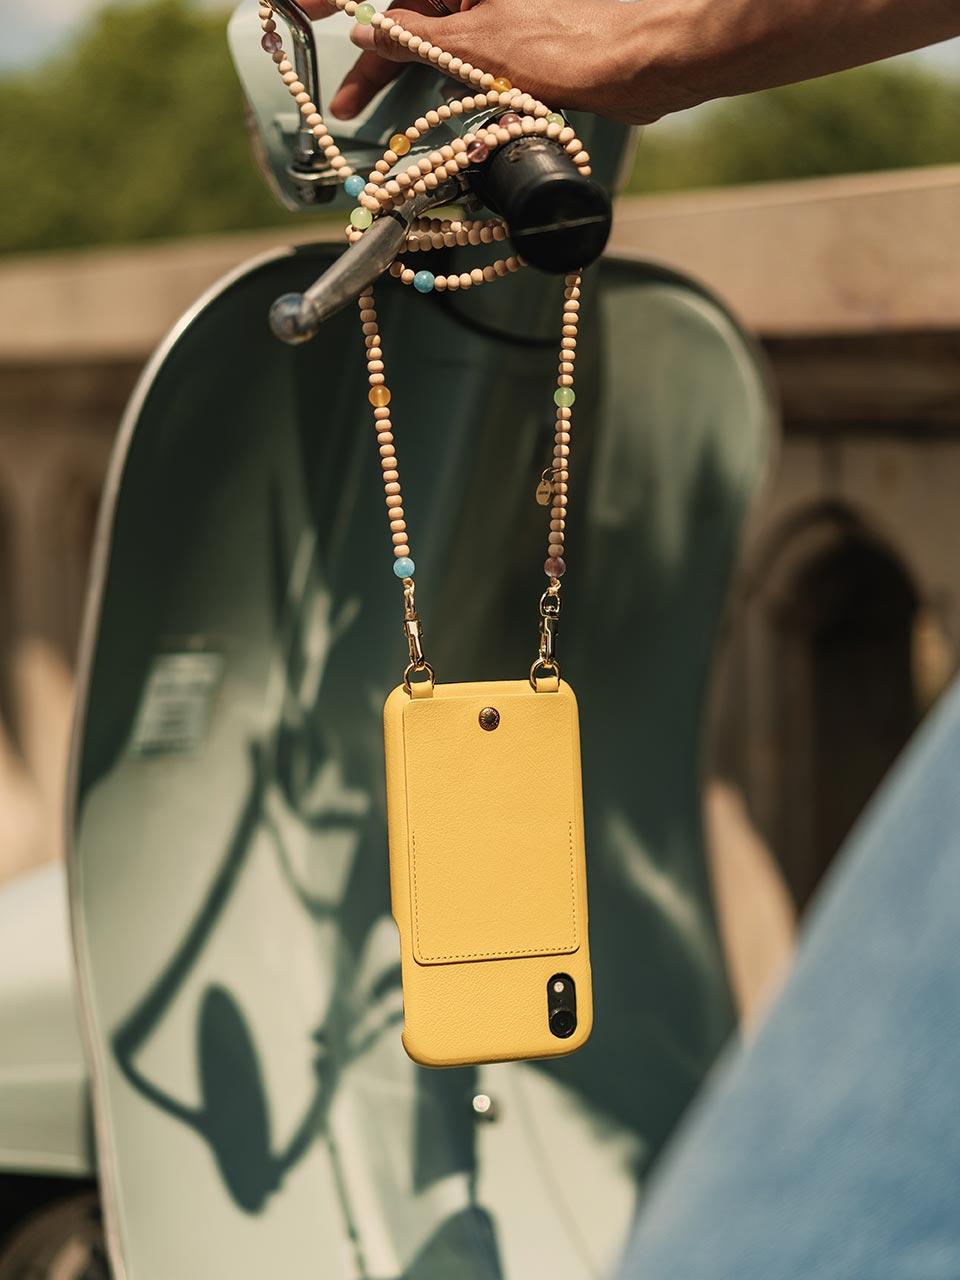 Louvini coque téléphone cuir